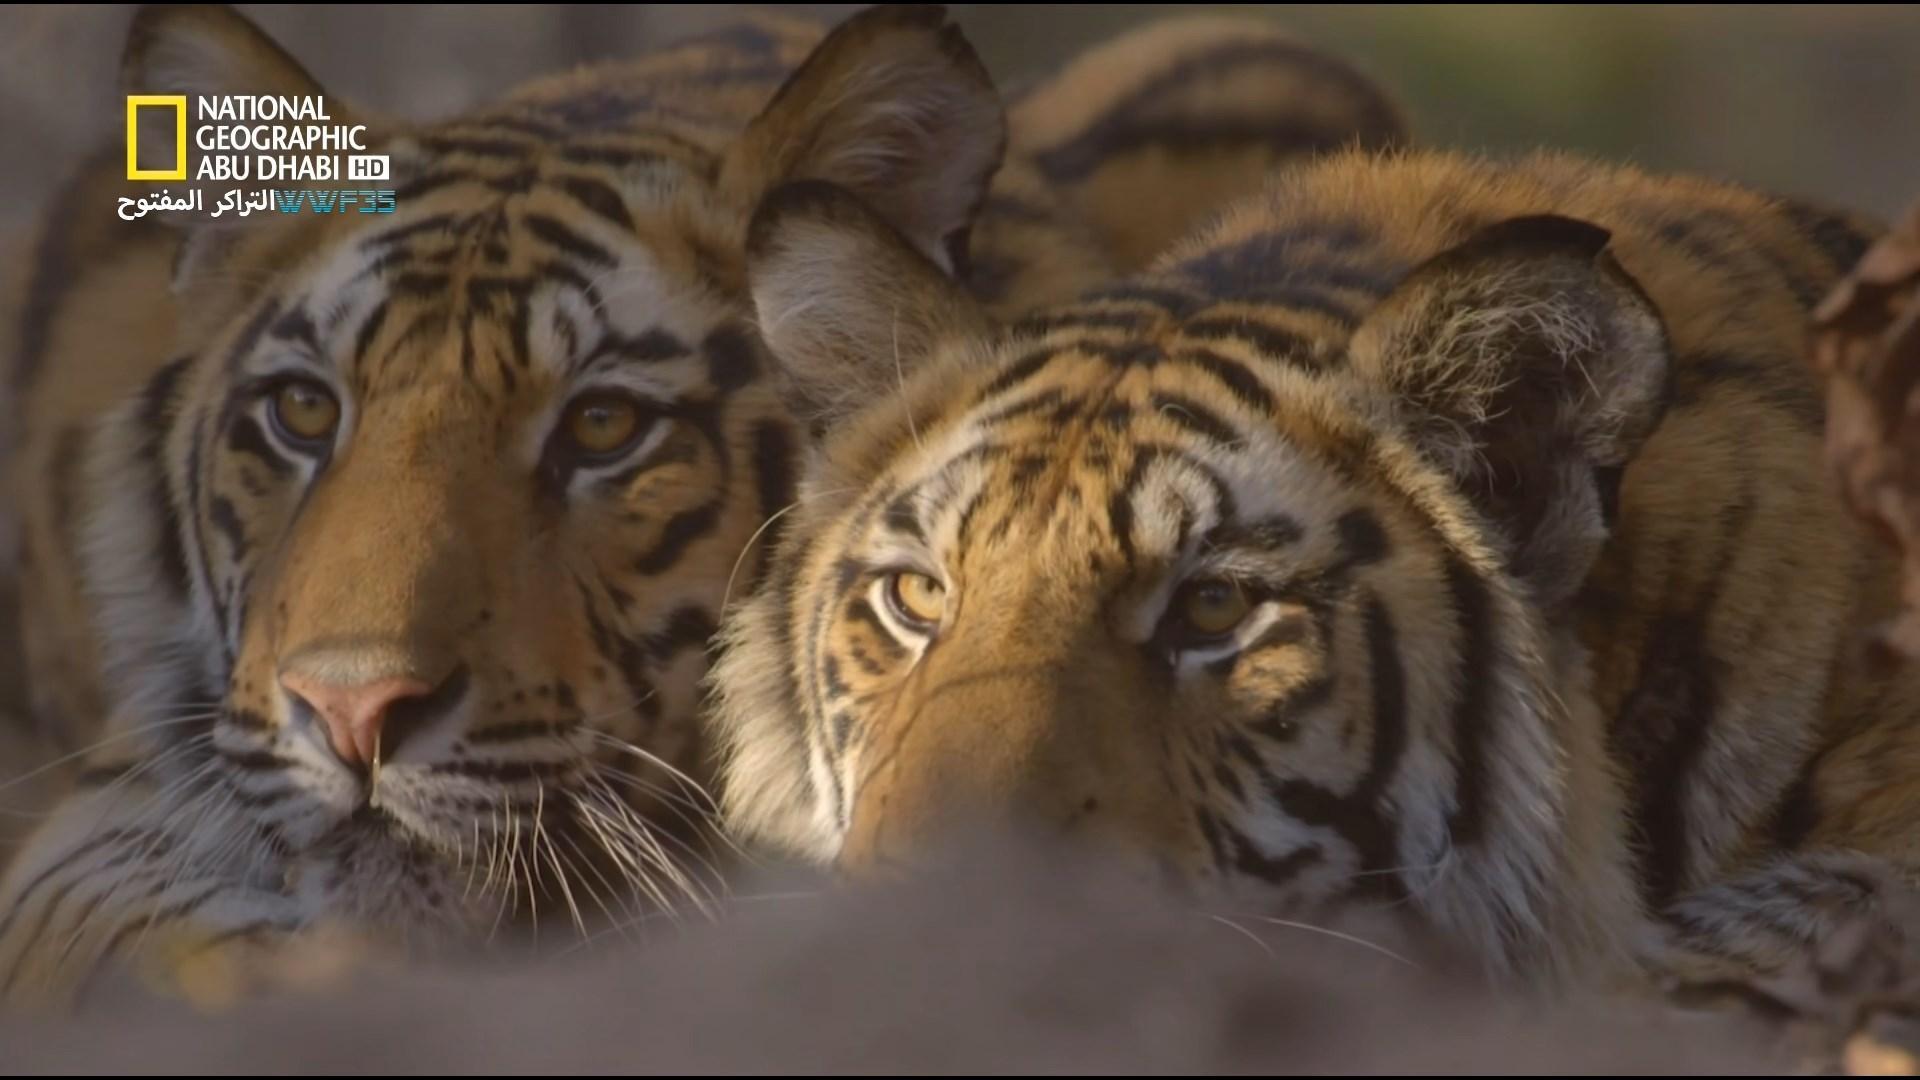 انقراض النمور counting tiger[مدبلج] [1080p] تحميل تورنت 7 arabp2p.com